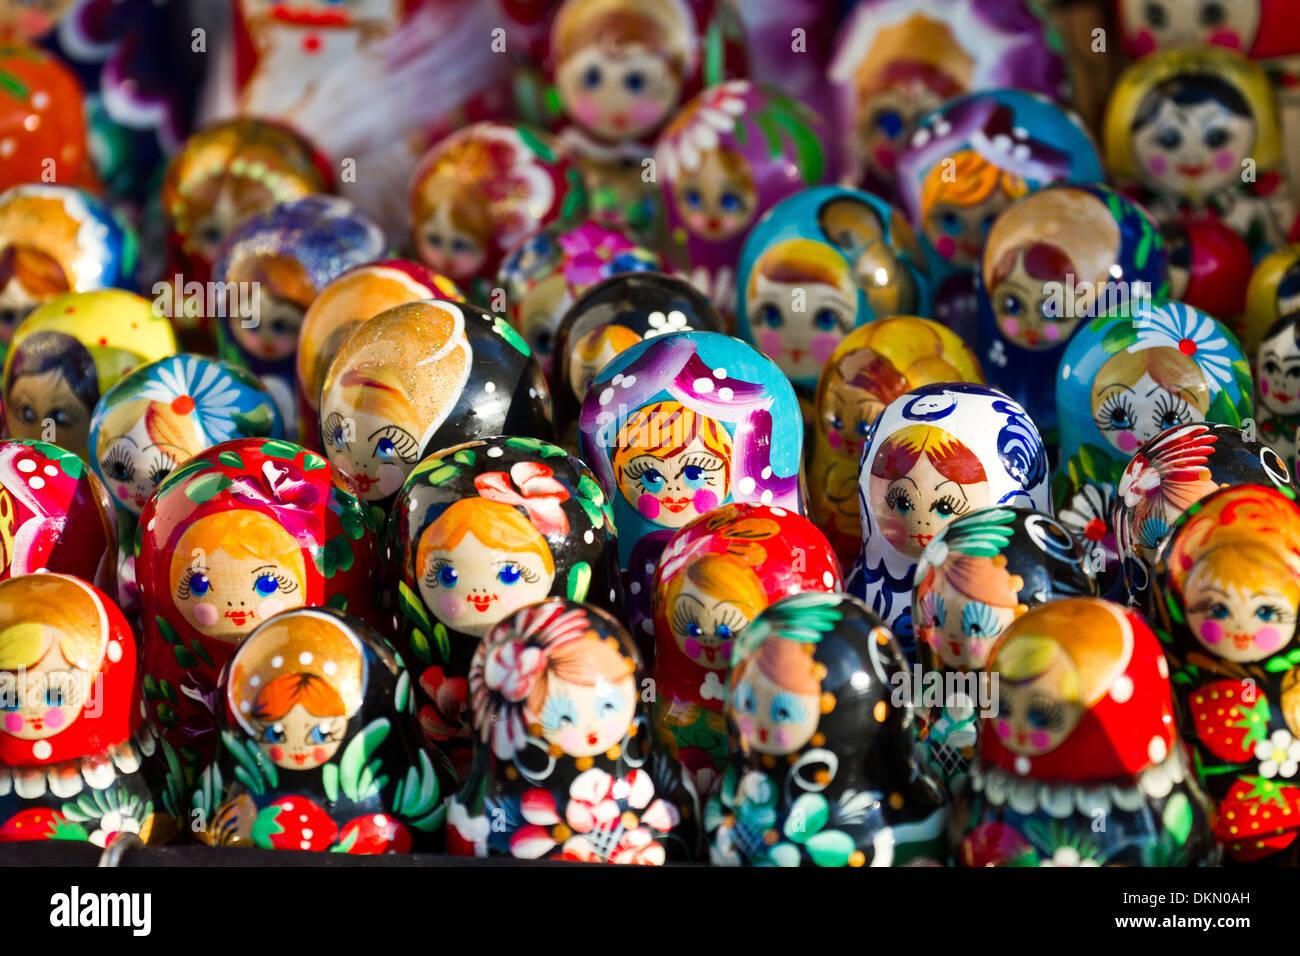 russian dolls toy stockfotos russian dolls toy bilder alamy. Black Bedroom Furniture Sets. Home Design Ideas